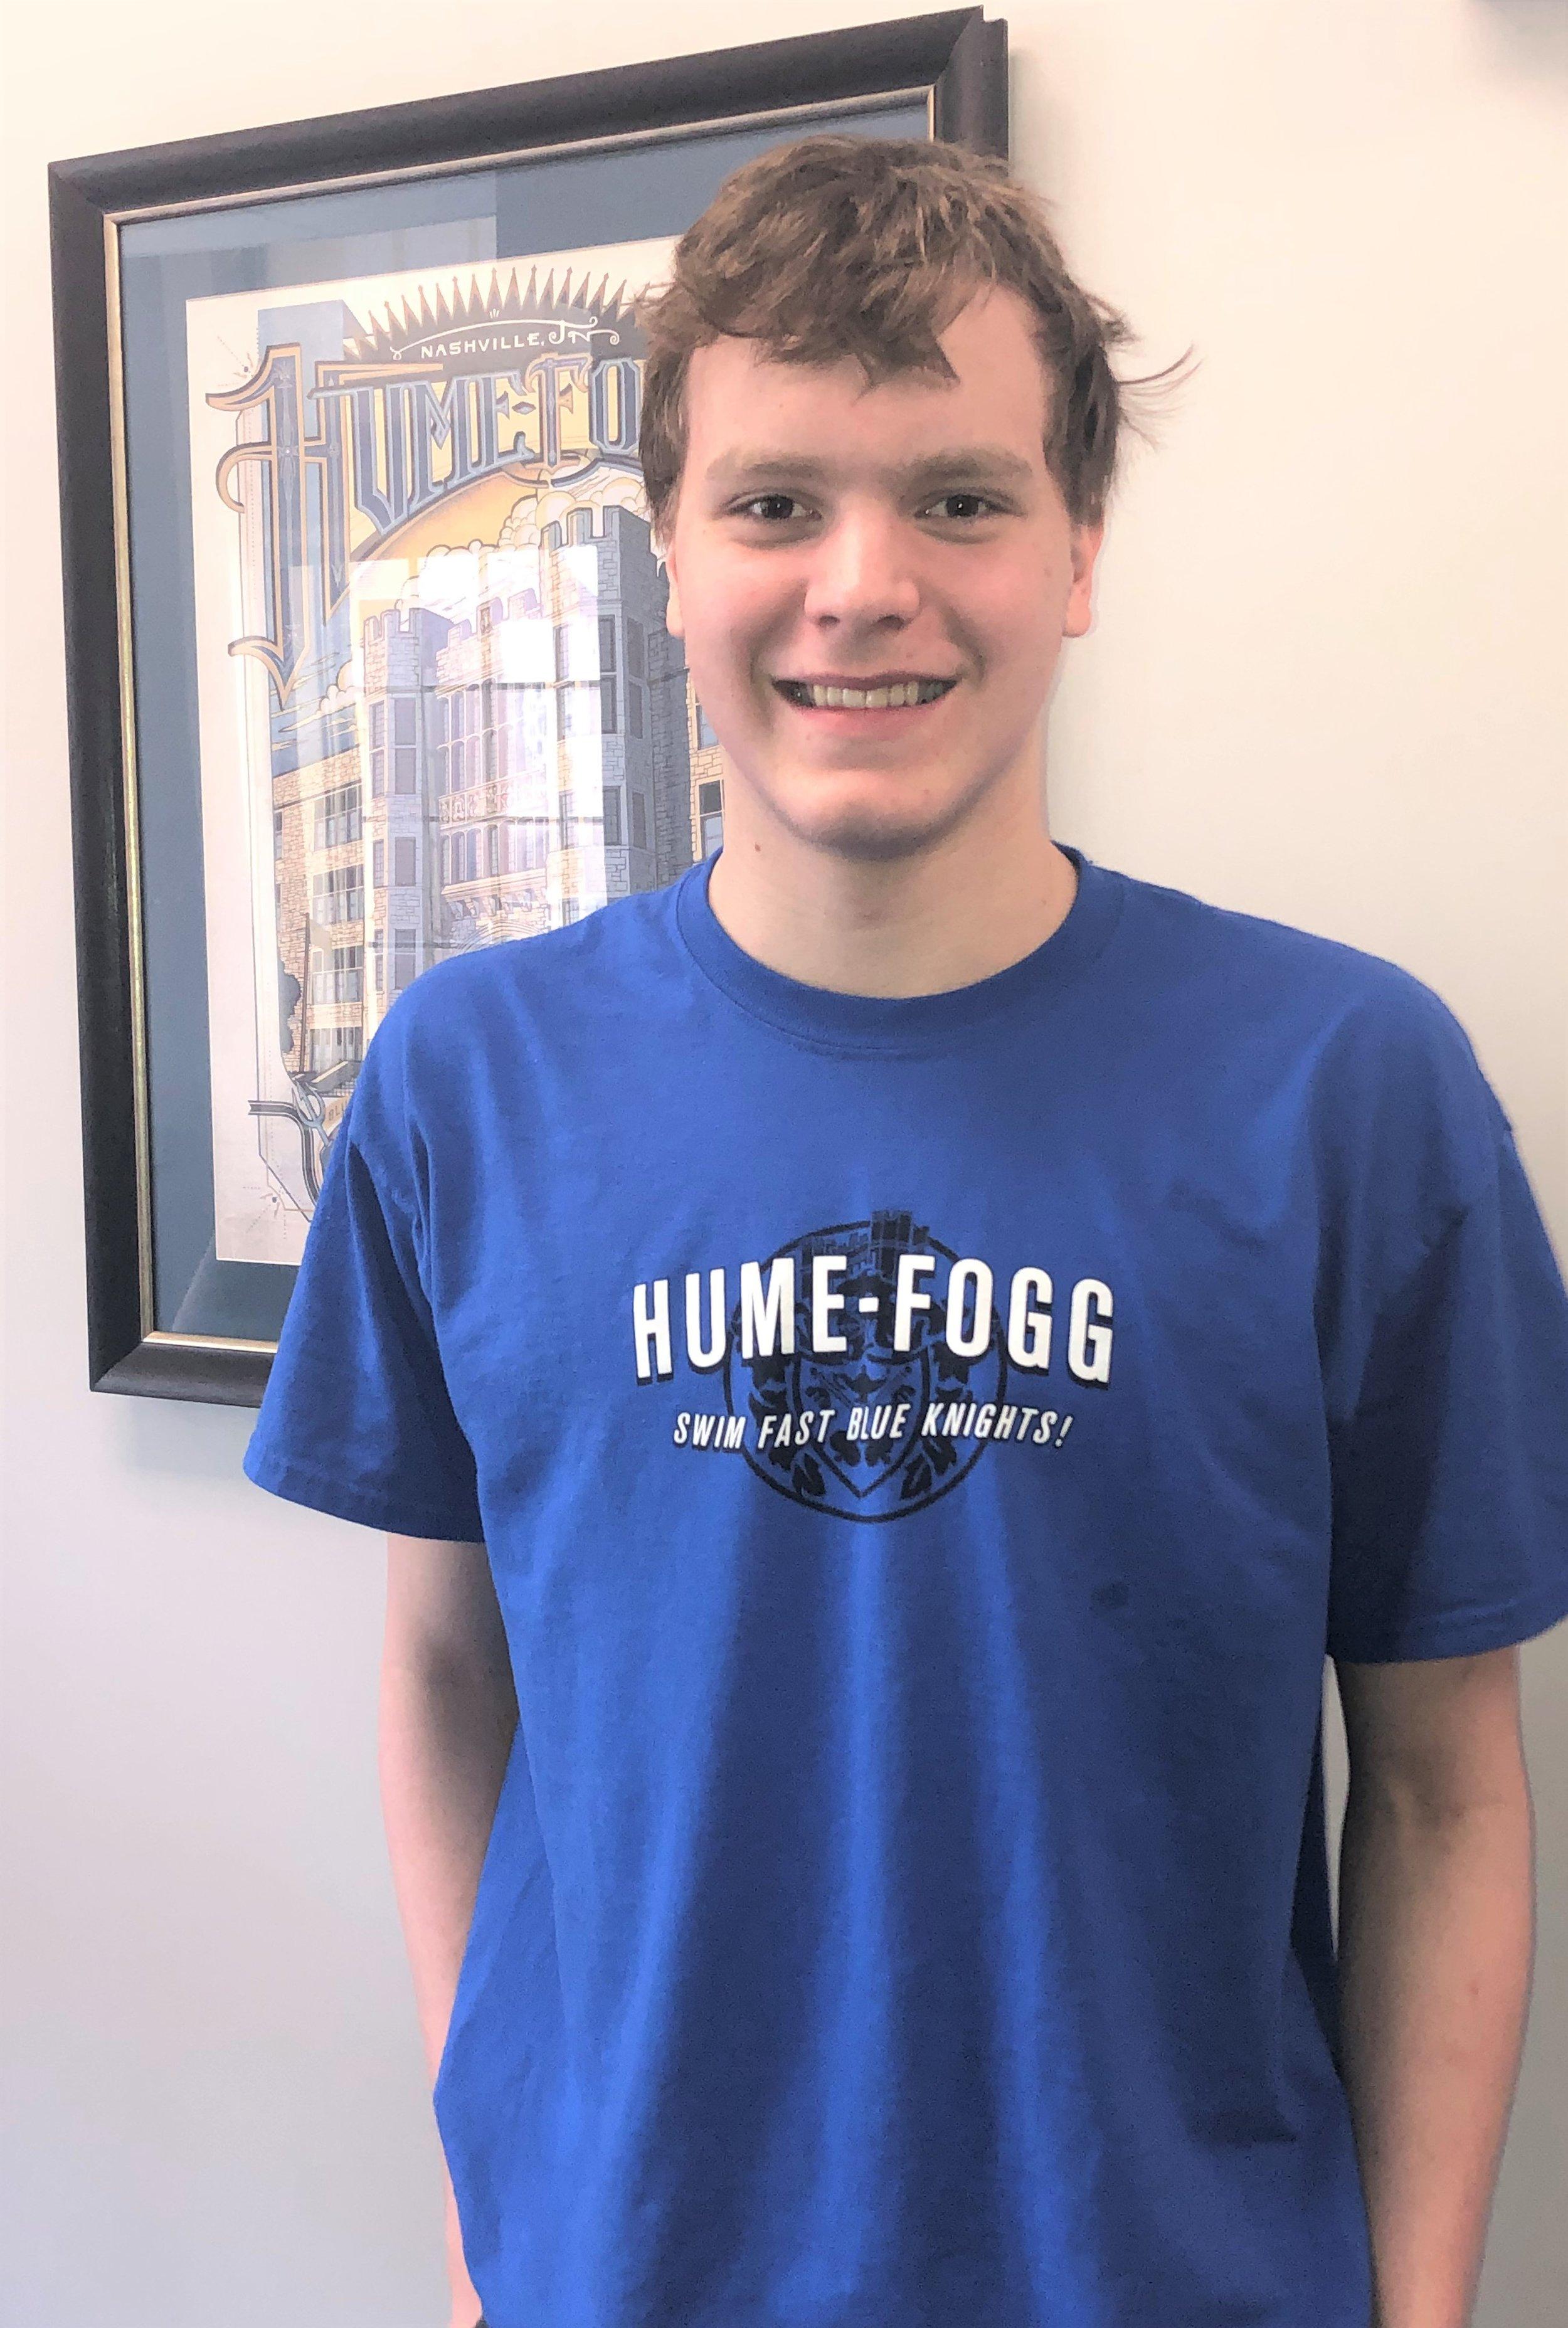 This week's #MNPSMVP is Ian Marshall – Hume-Fogg Academic High School